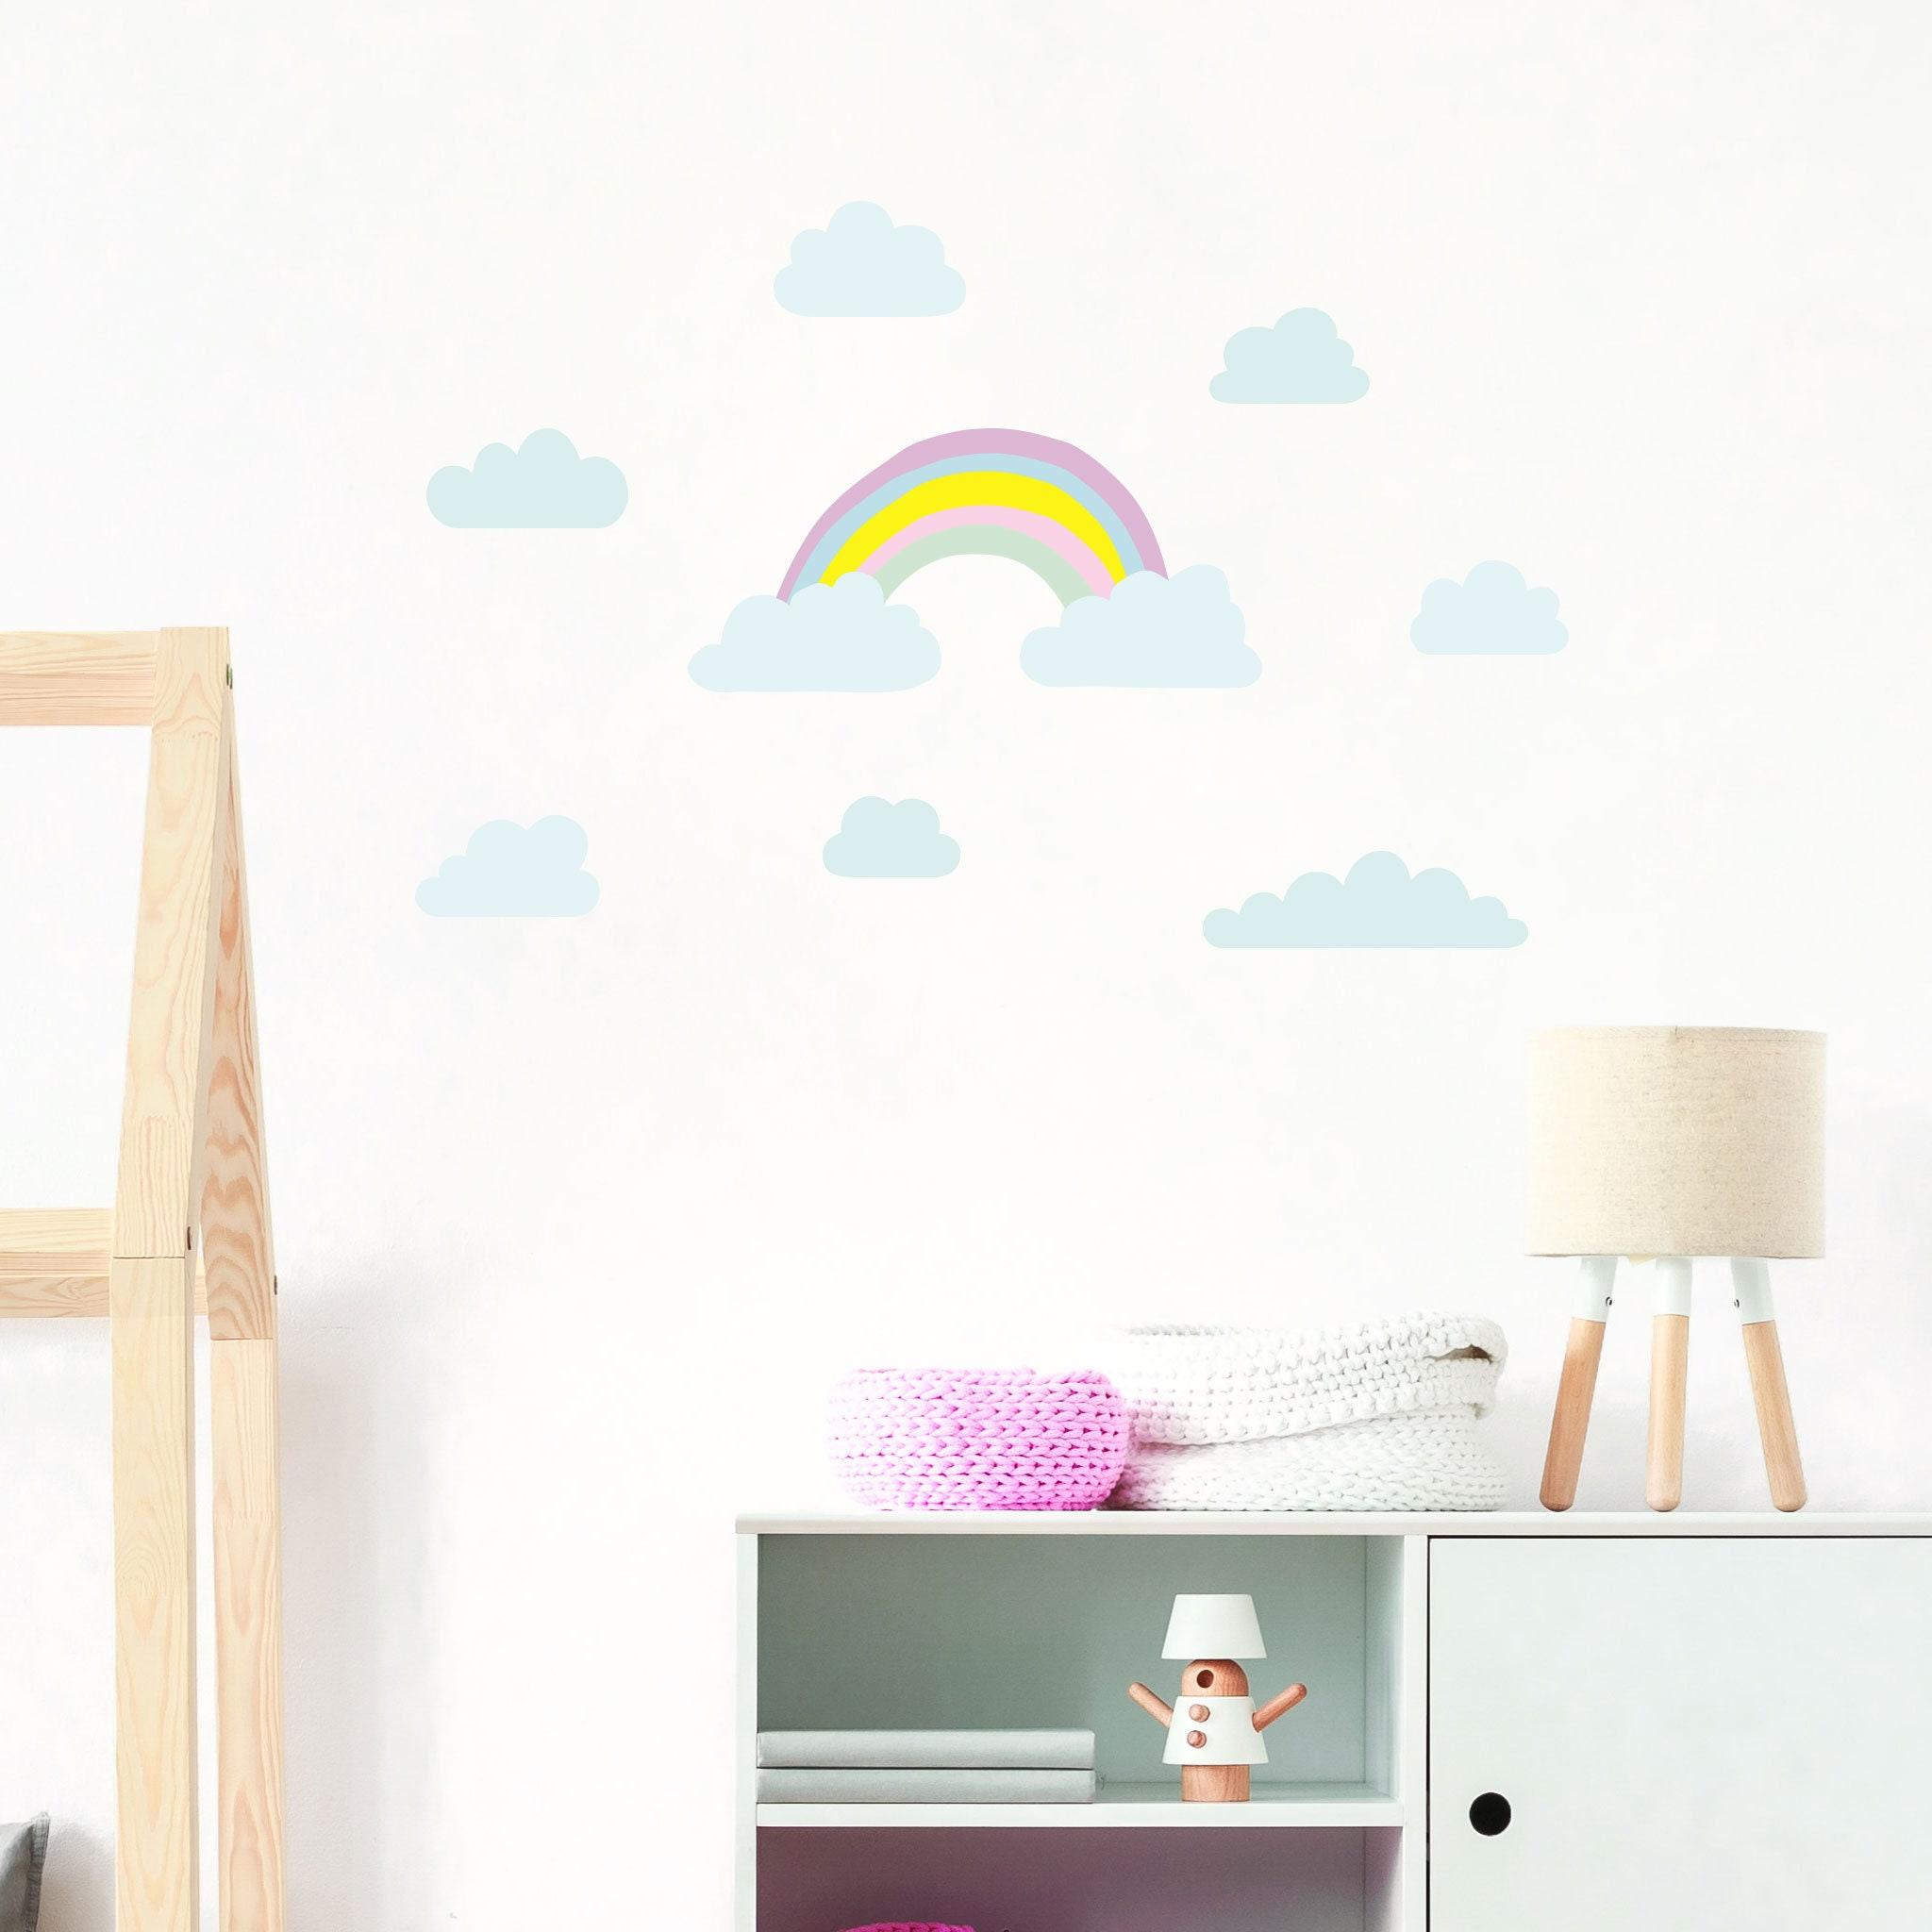 Regenbogen Sonne Stern Kindergarten Wand dekor Wandsticker WANDTATTOO Art 951